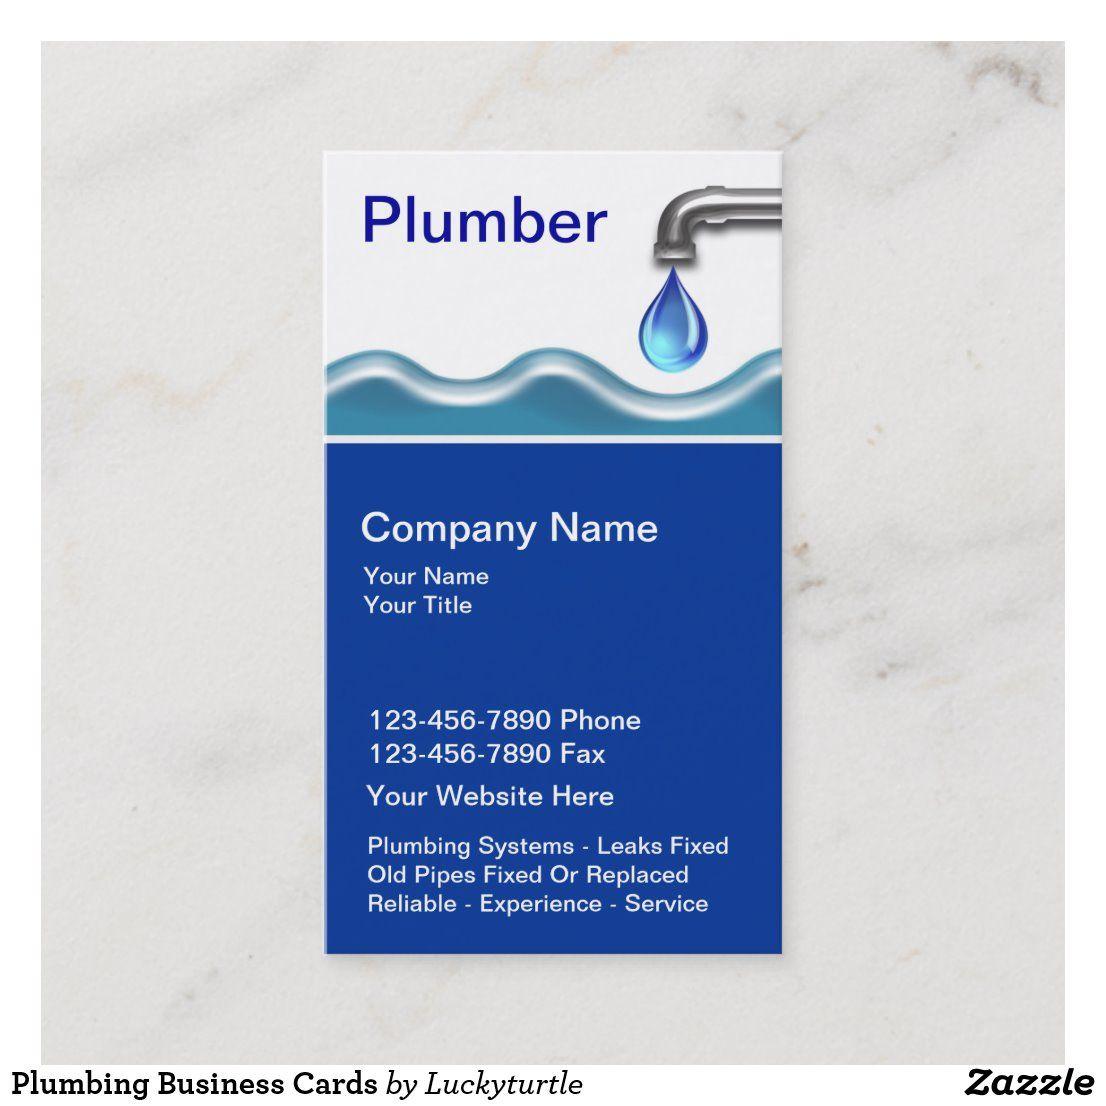 Plumbing Business Cards Zazzle Com Plumbing Plumbers Gift Business Cards